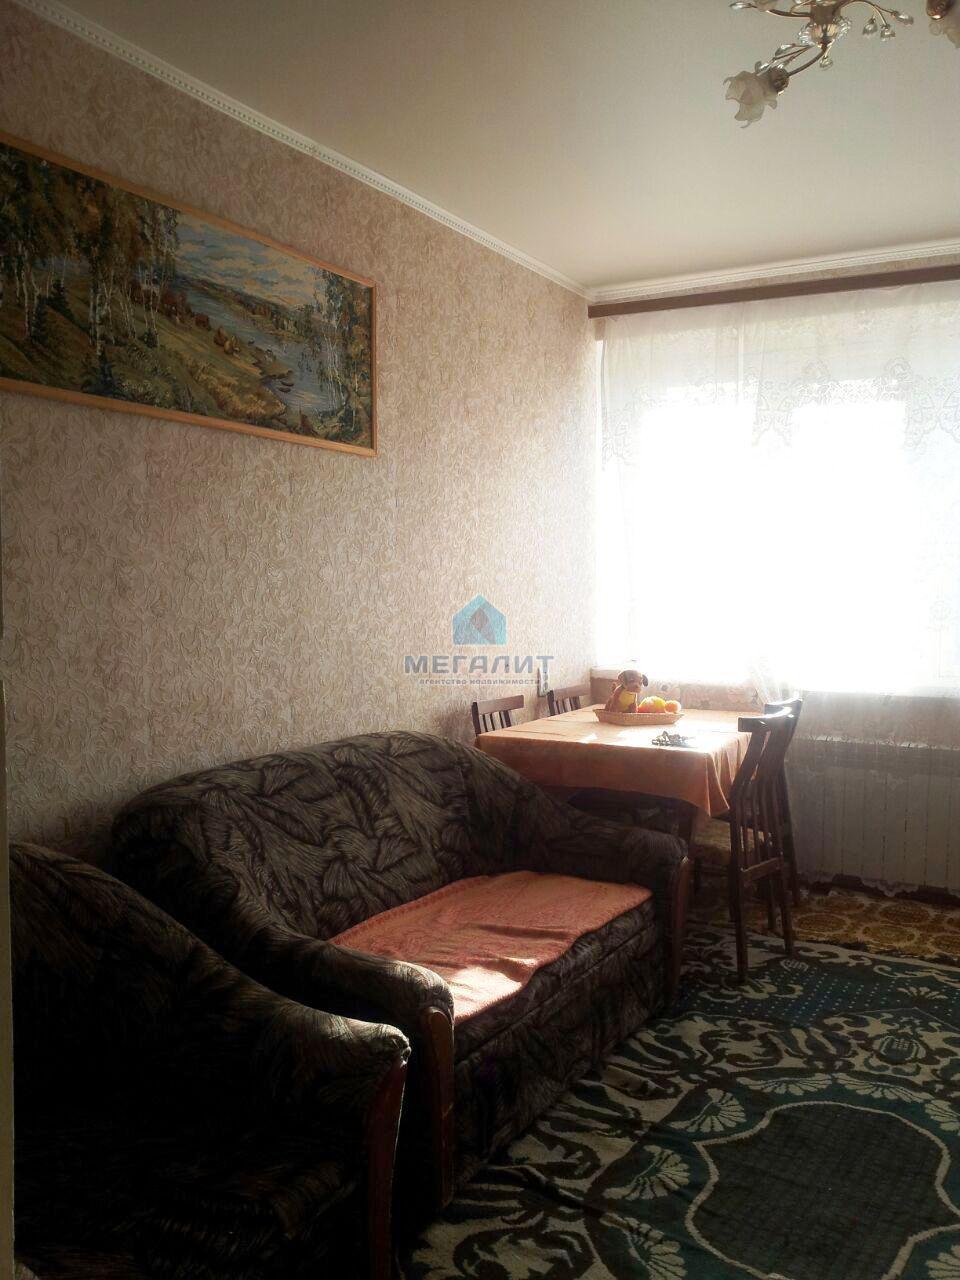 Аренда 2-к квартиры Можайского 17, 55 м2  (миниатюра №10)